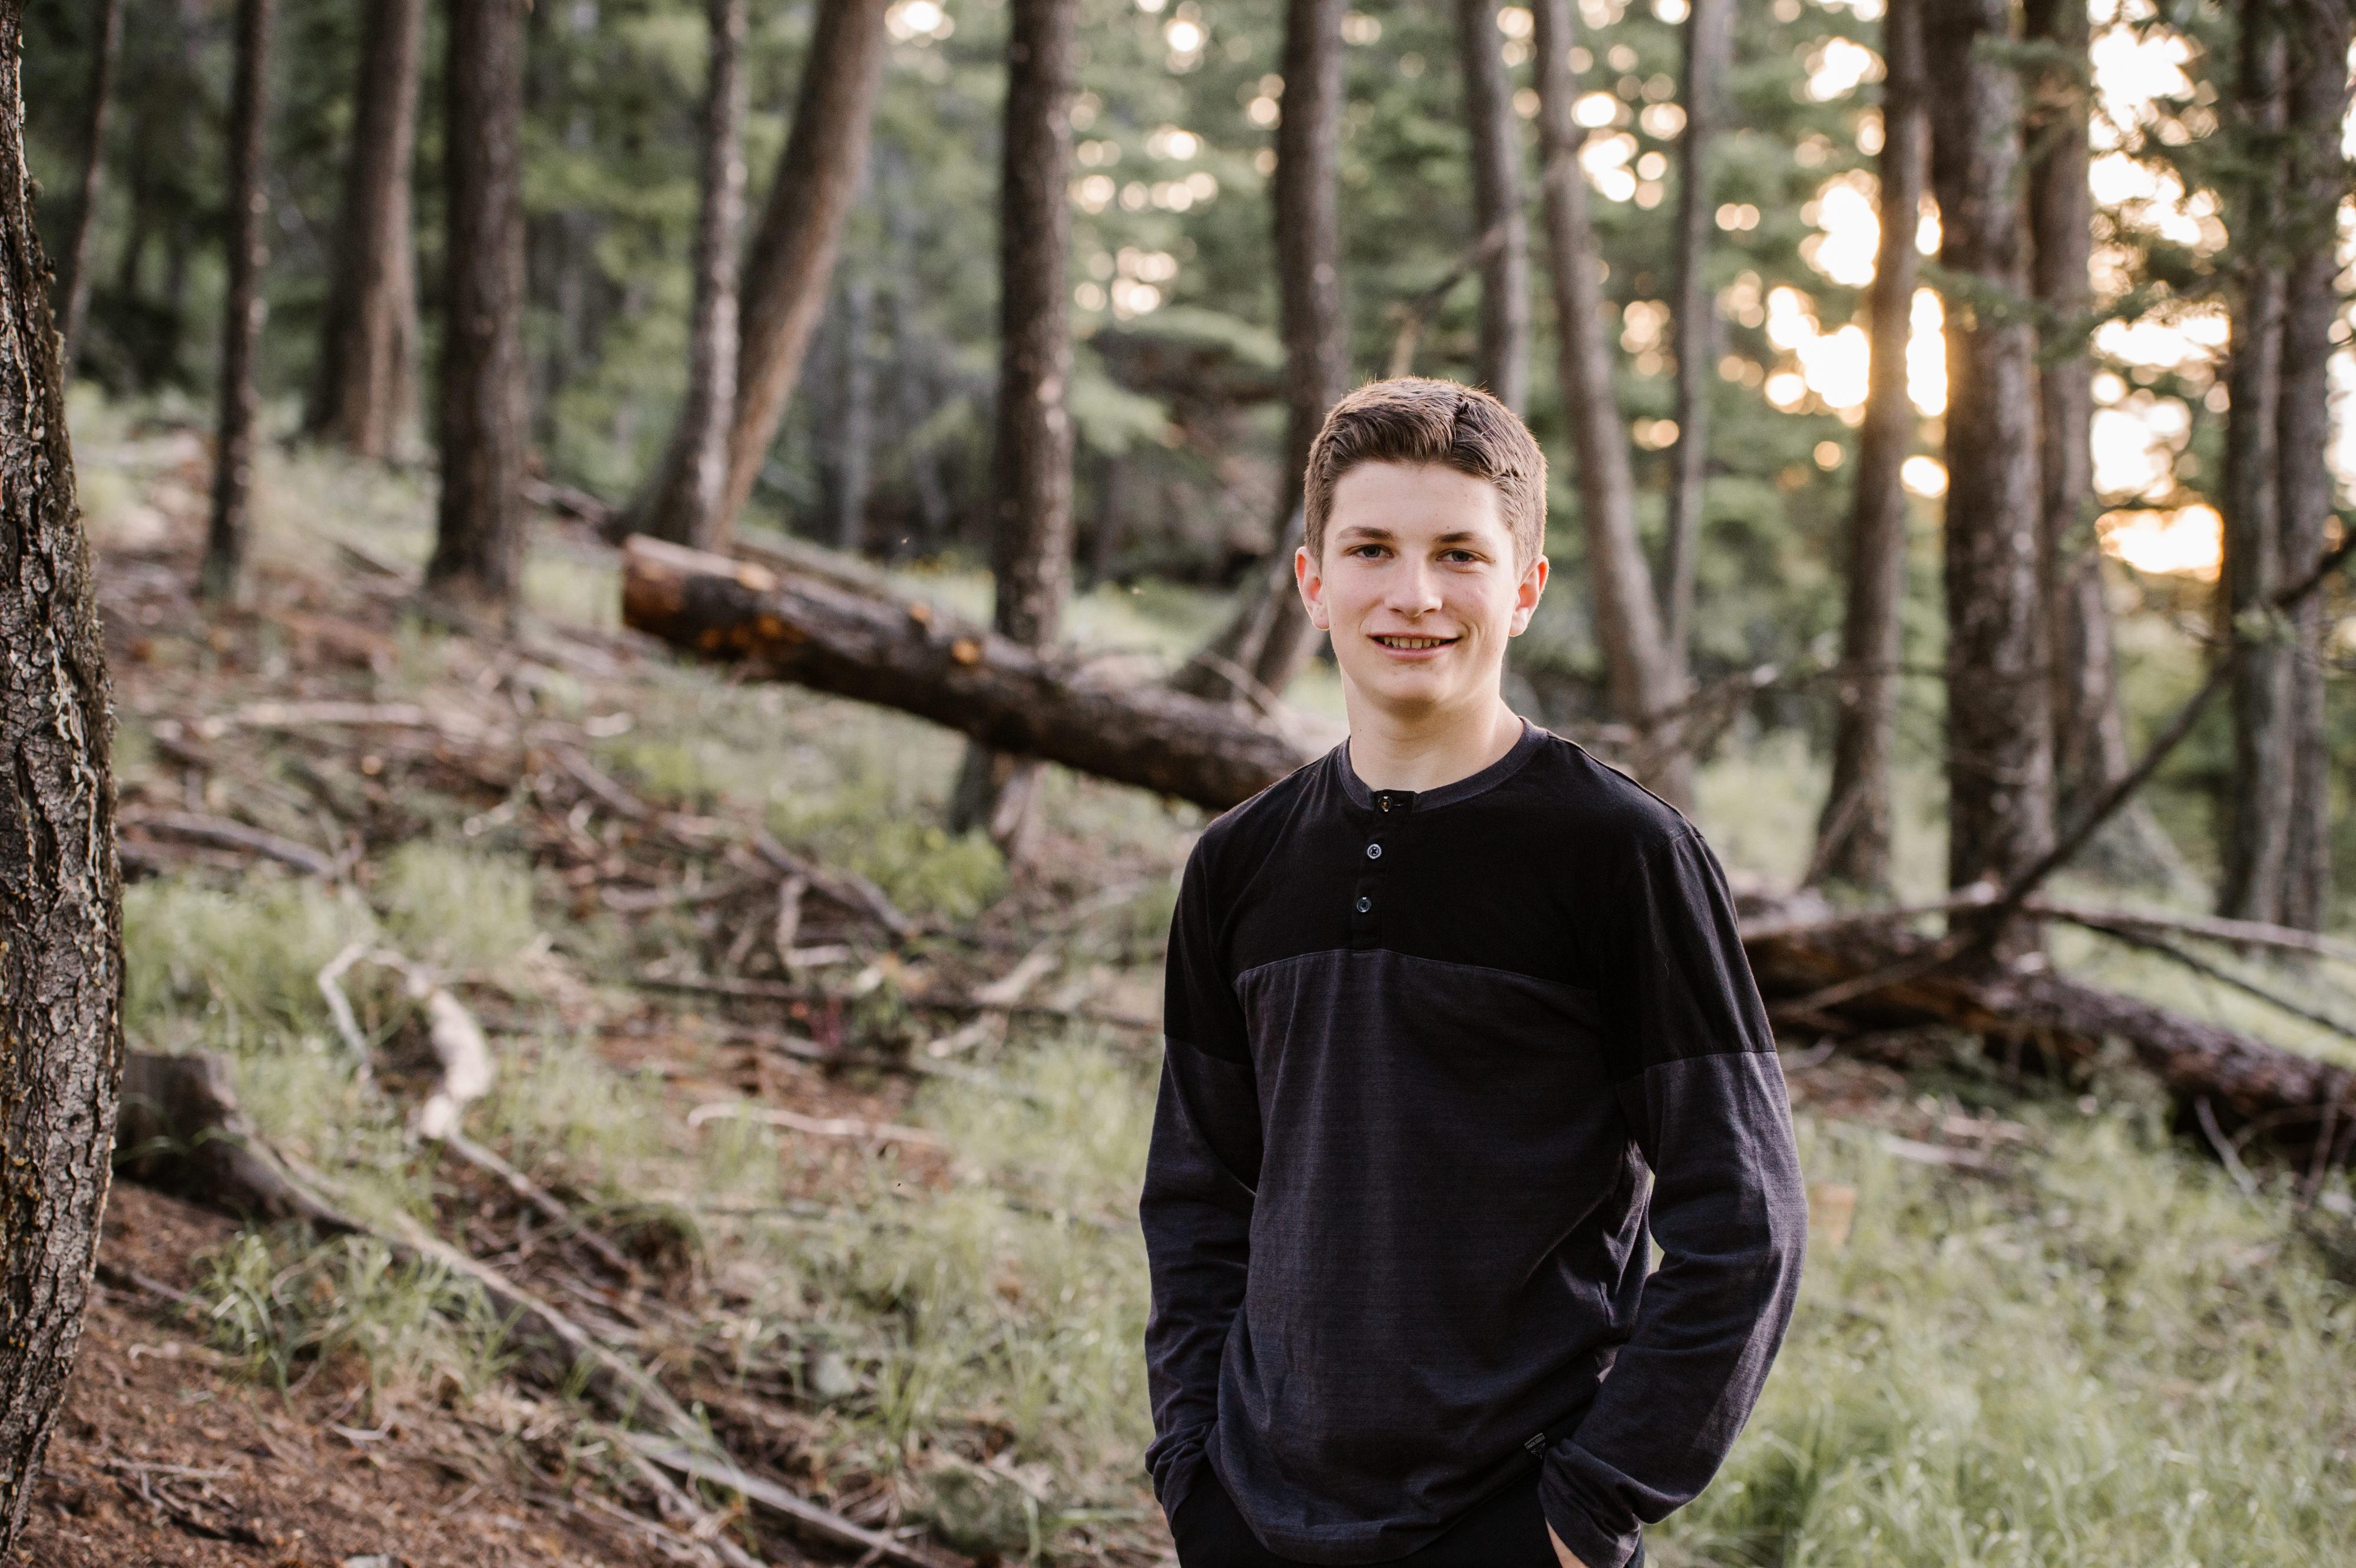 Harper Mountain family session golden hour sunshine portrait teen grad session Kamloops BC Okanagan photographer